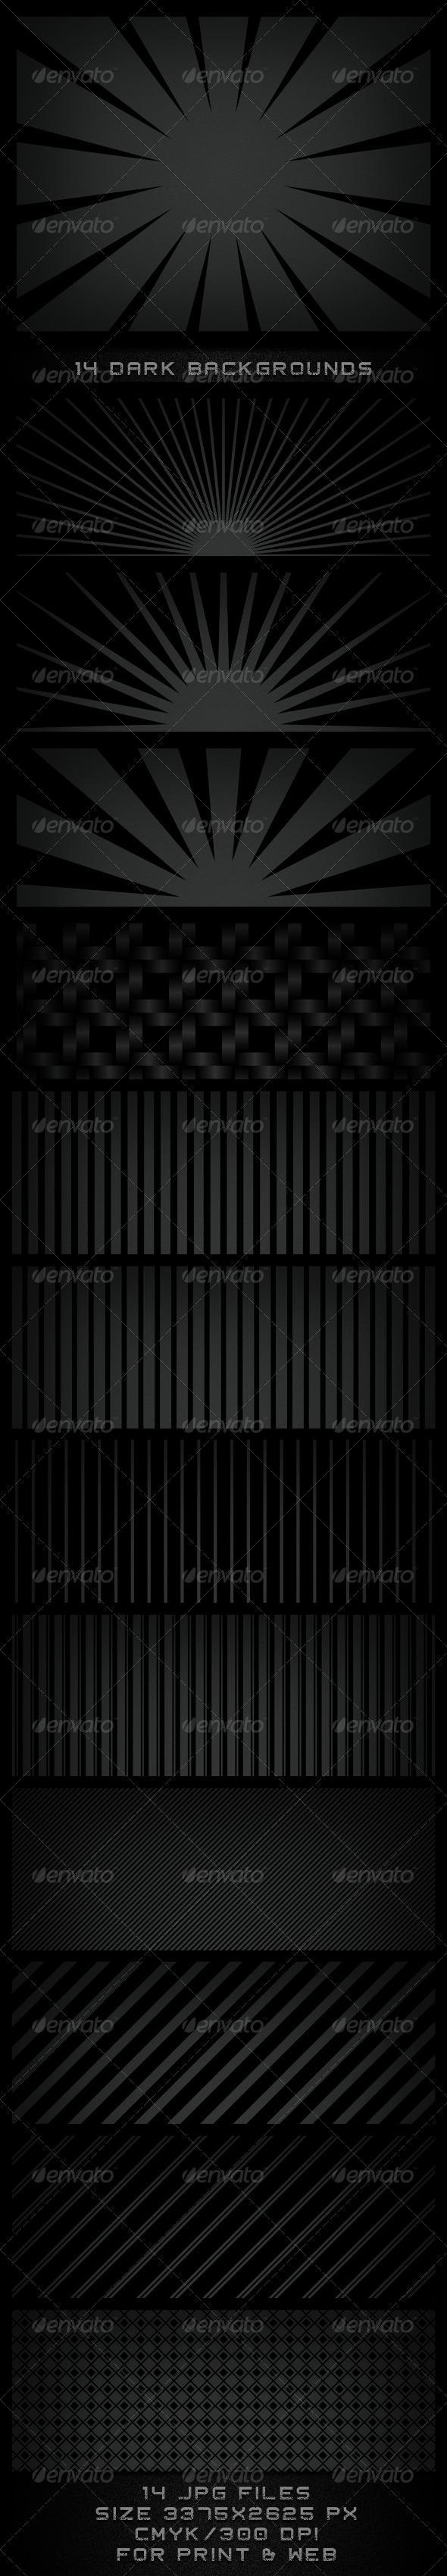 GraphicRiver Dark Backgrounds 502425